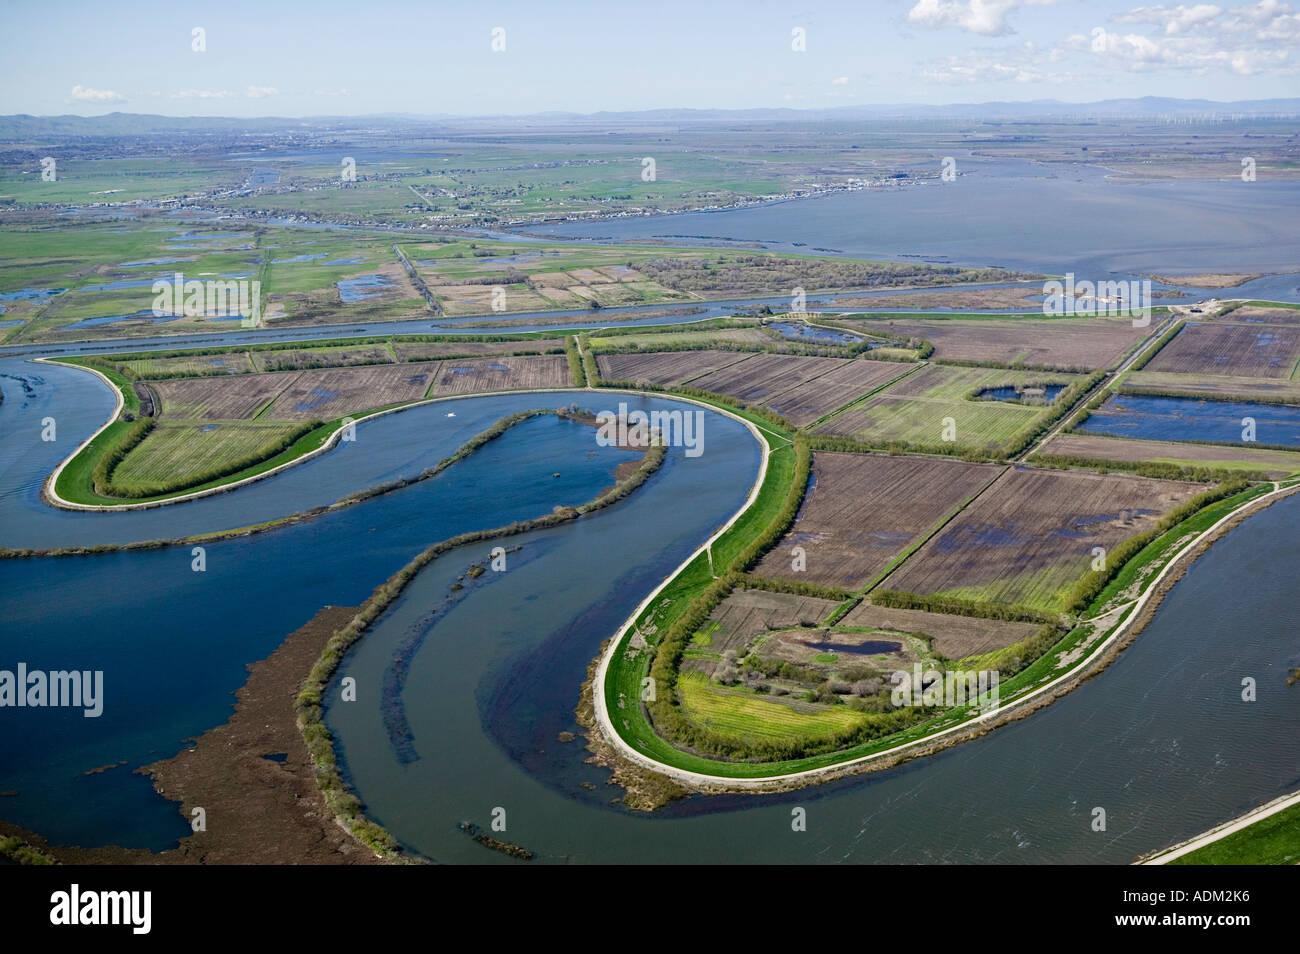 aerial view above Sacramento San Joaquin river delta, northern California - Stock Image